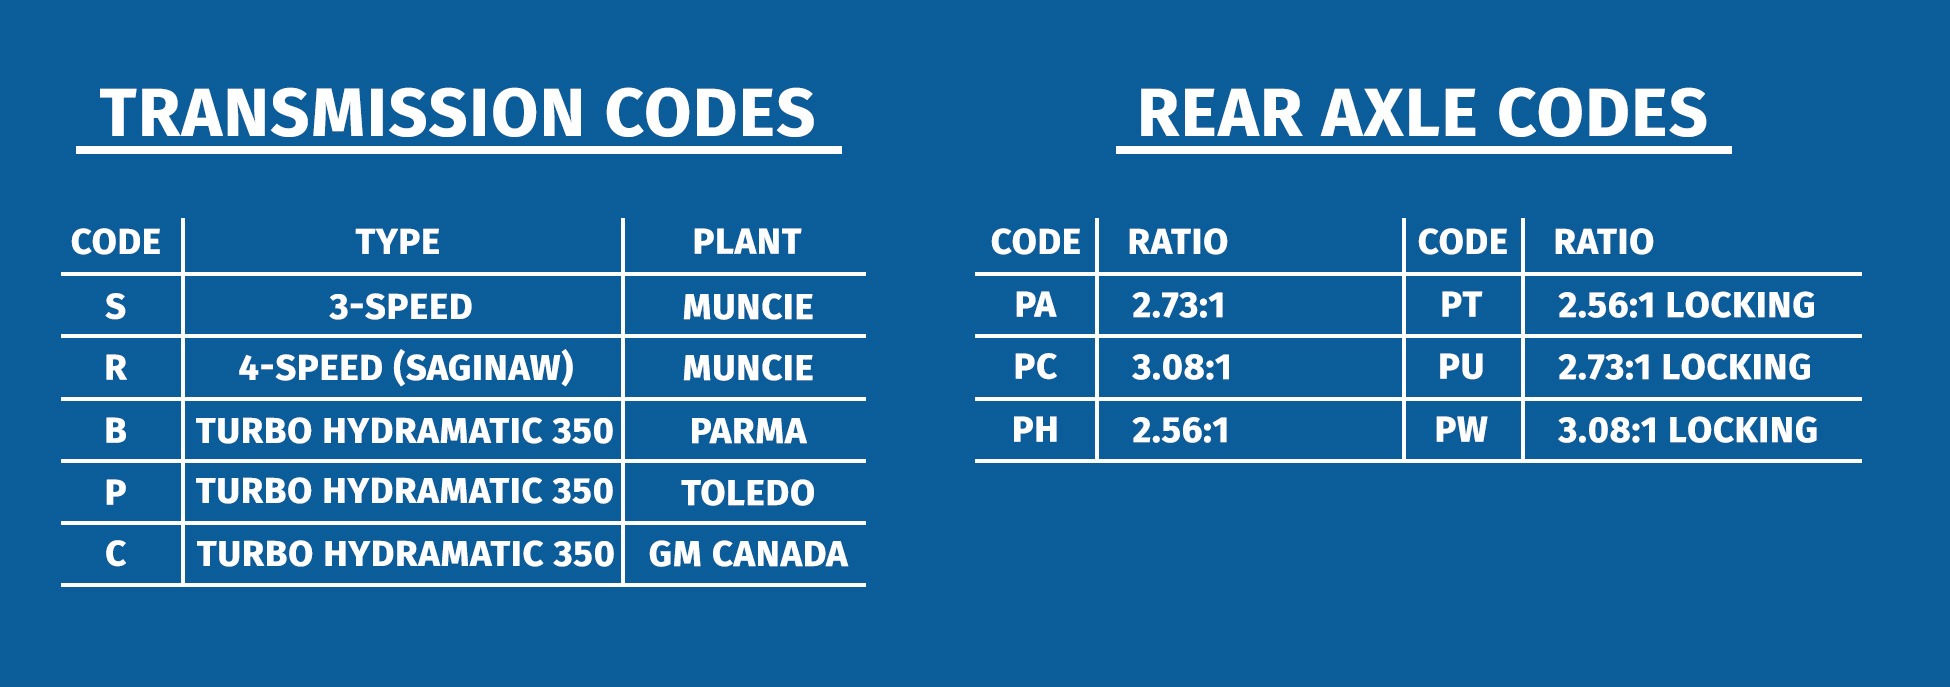 1977 Camaro Parts And Restoration Information Monaco Rv Wiring Diagram M38d Transmission Rear Axle Codes